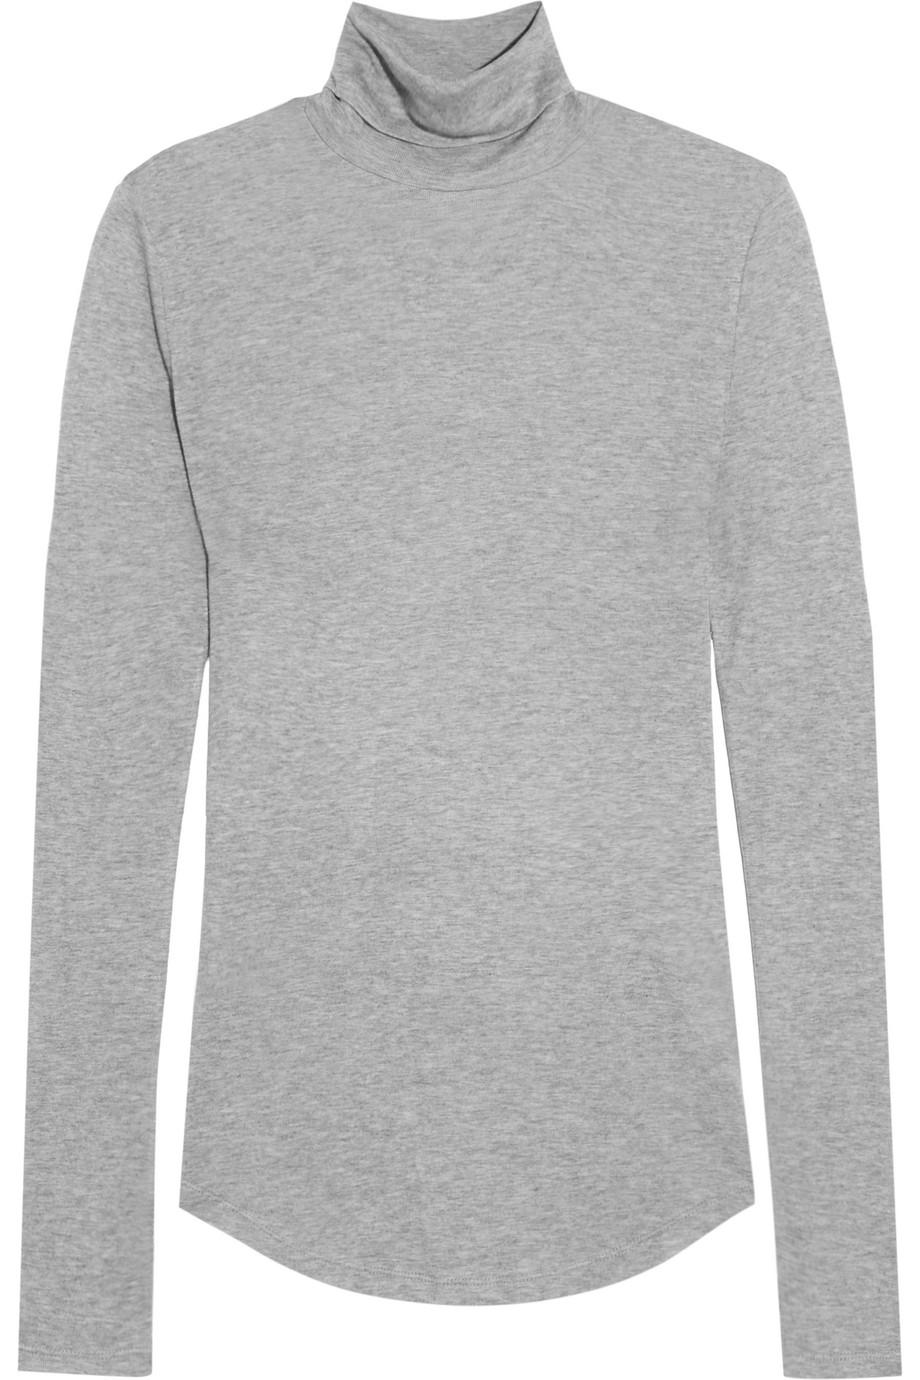 J.Crew Tencel and Cashmere-Blend Turtleneck Sweater, Gray, Women's, Size: XL